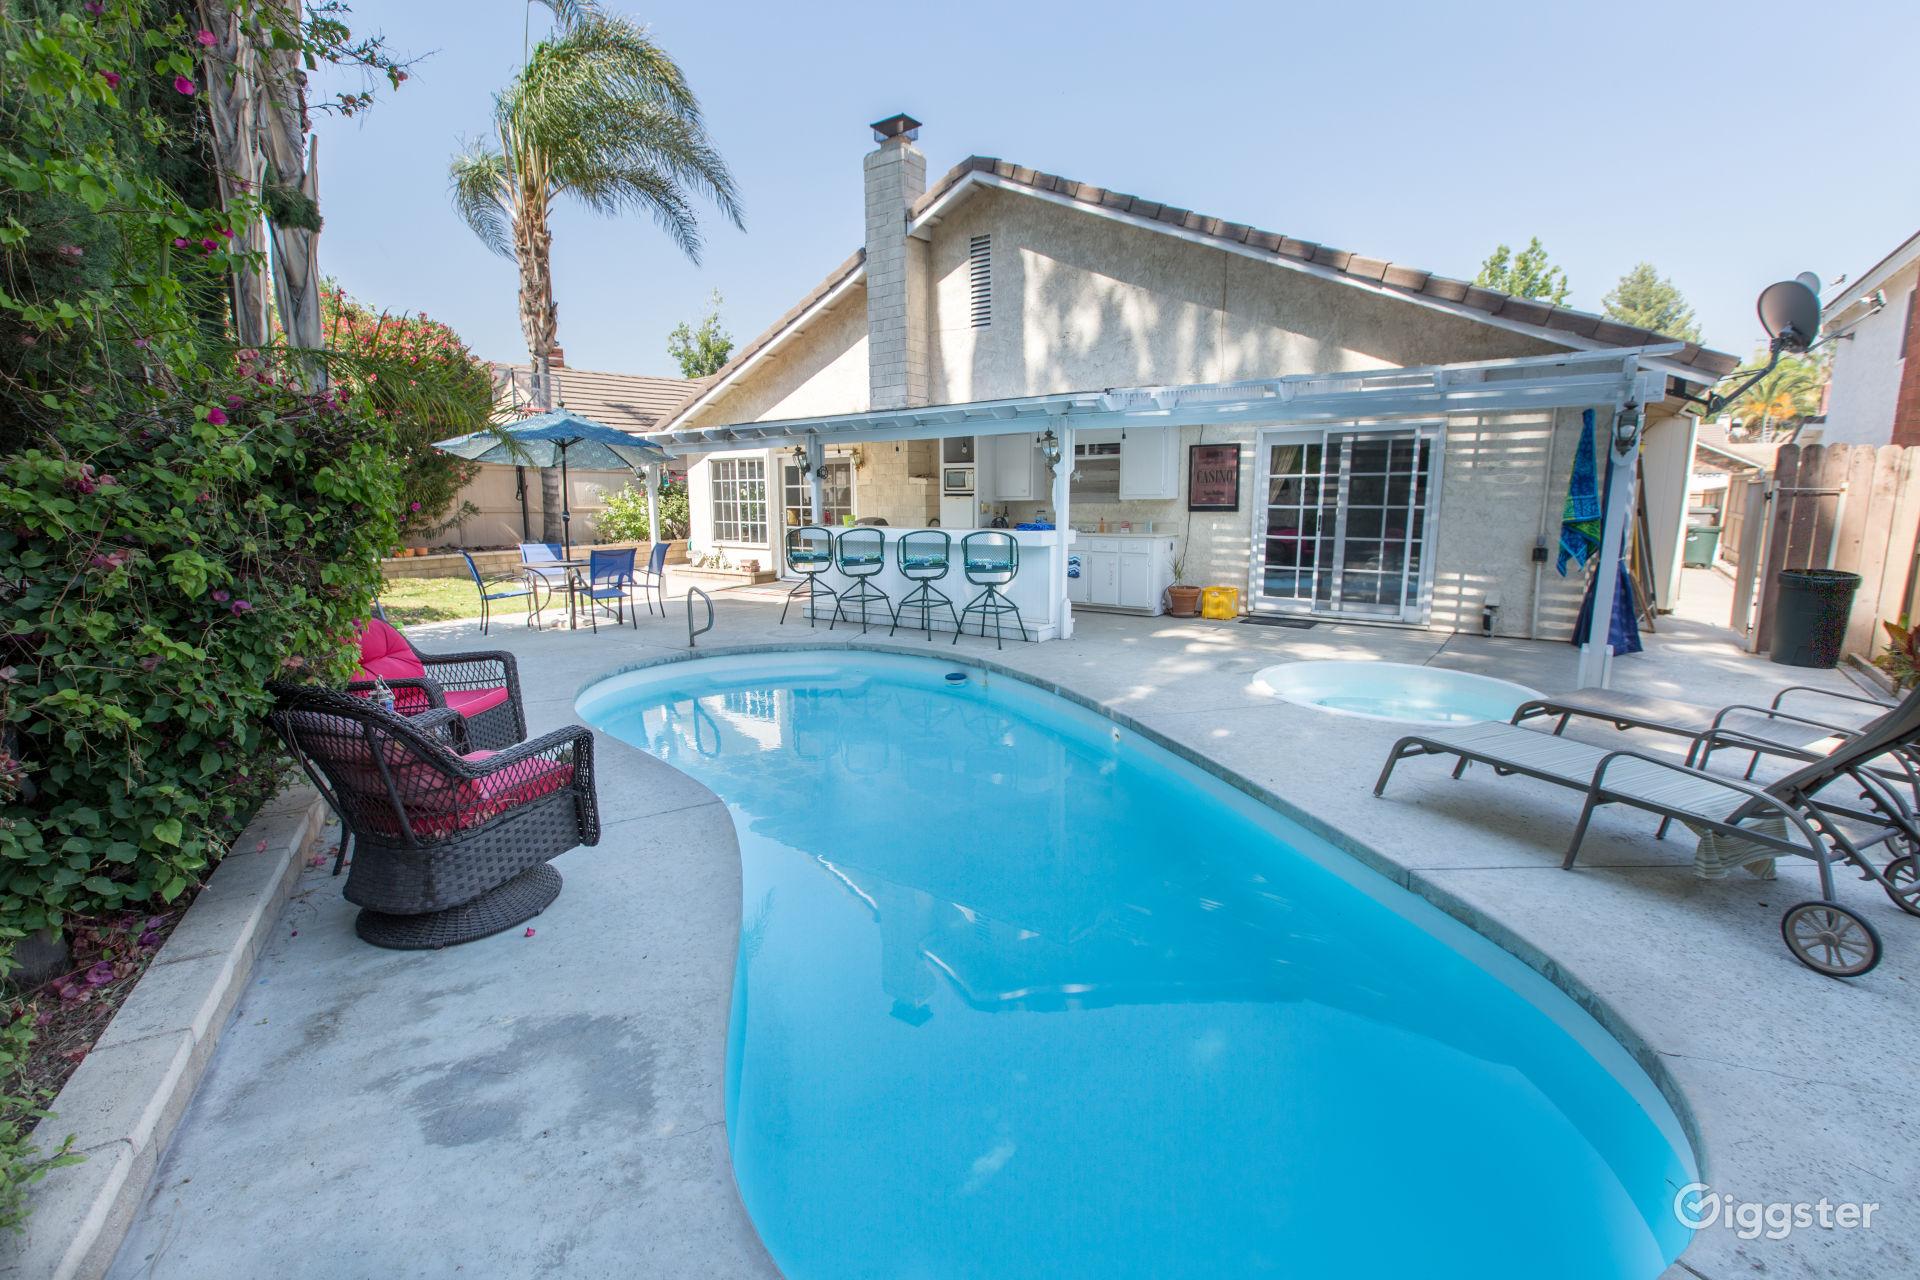 Backyard Beach House in Santa Clarita Los Angeles Rental